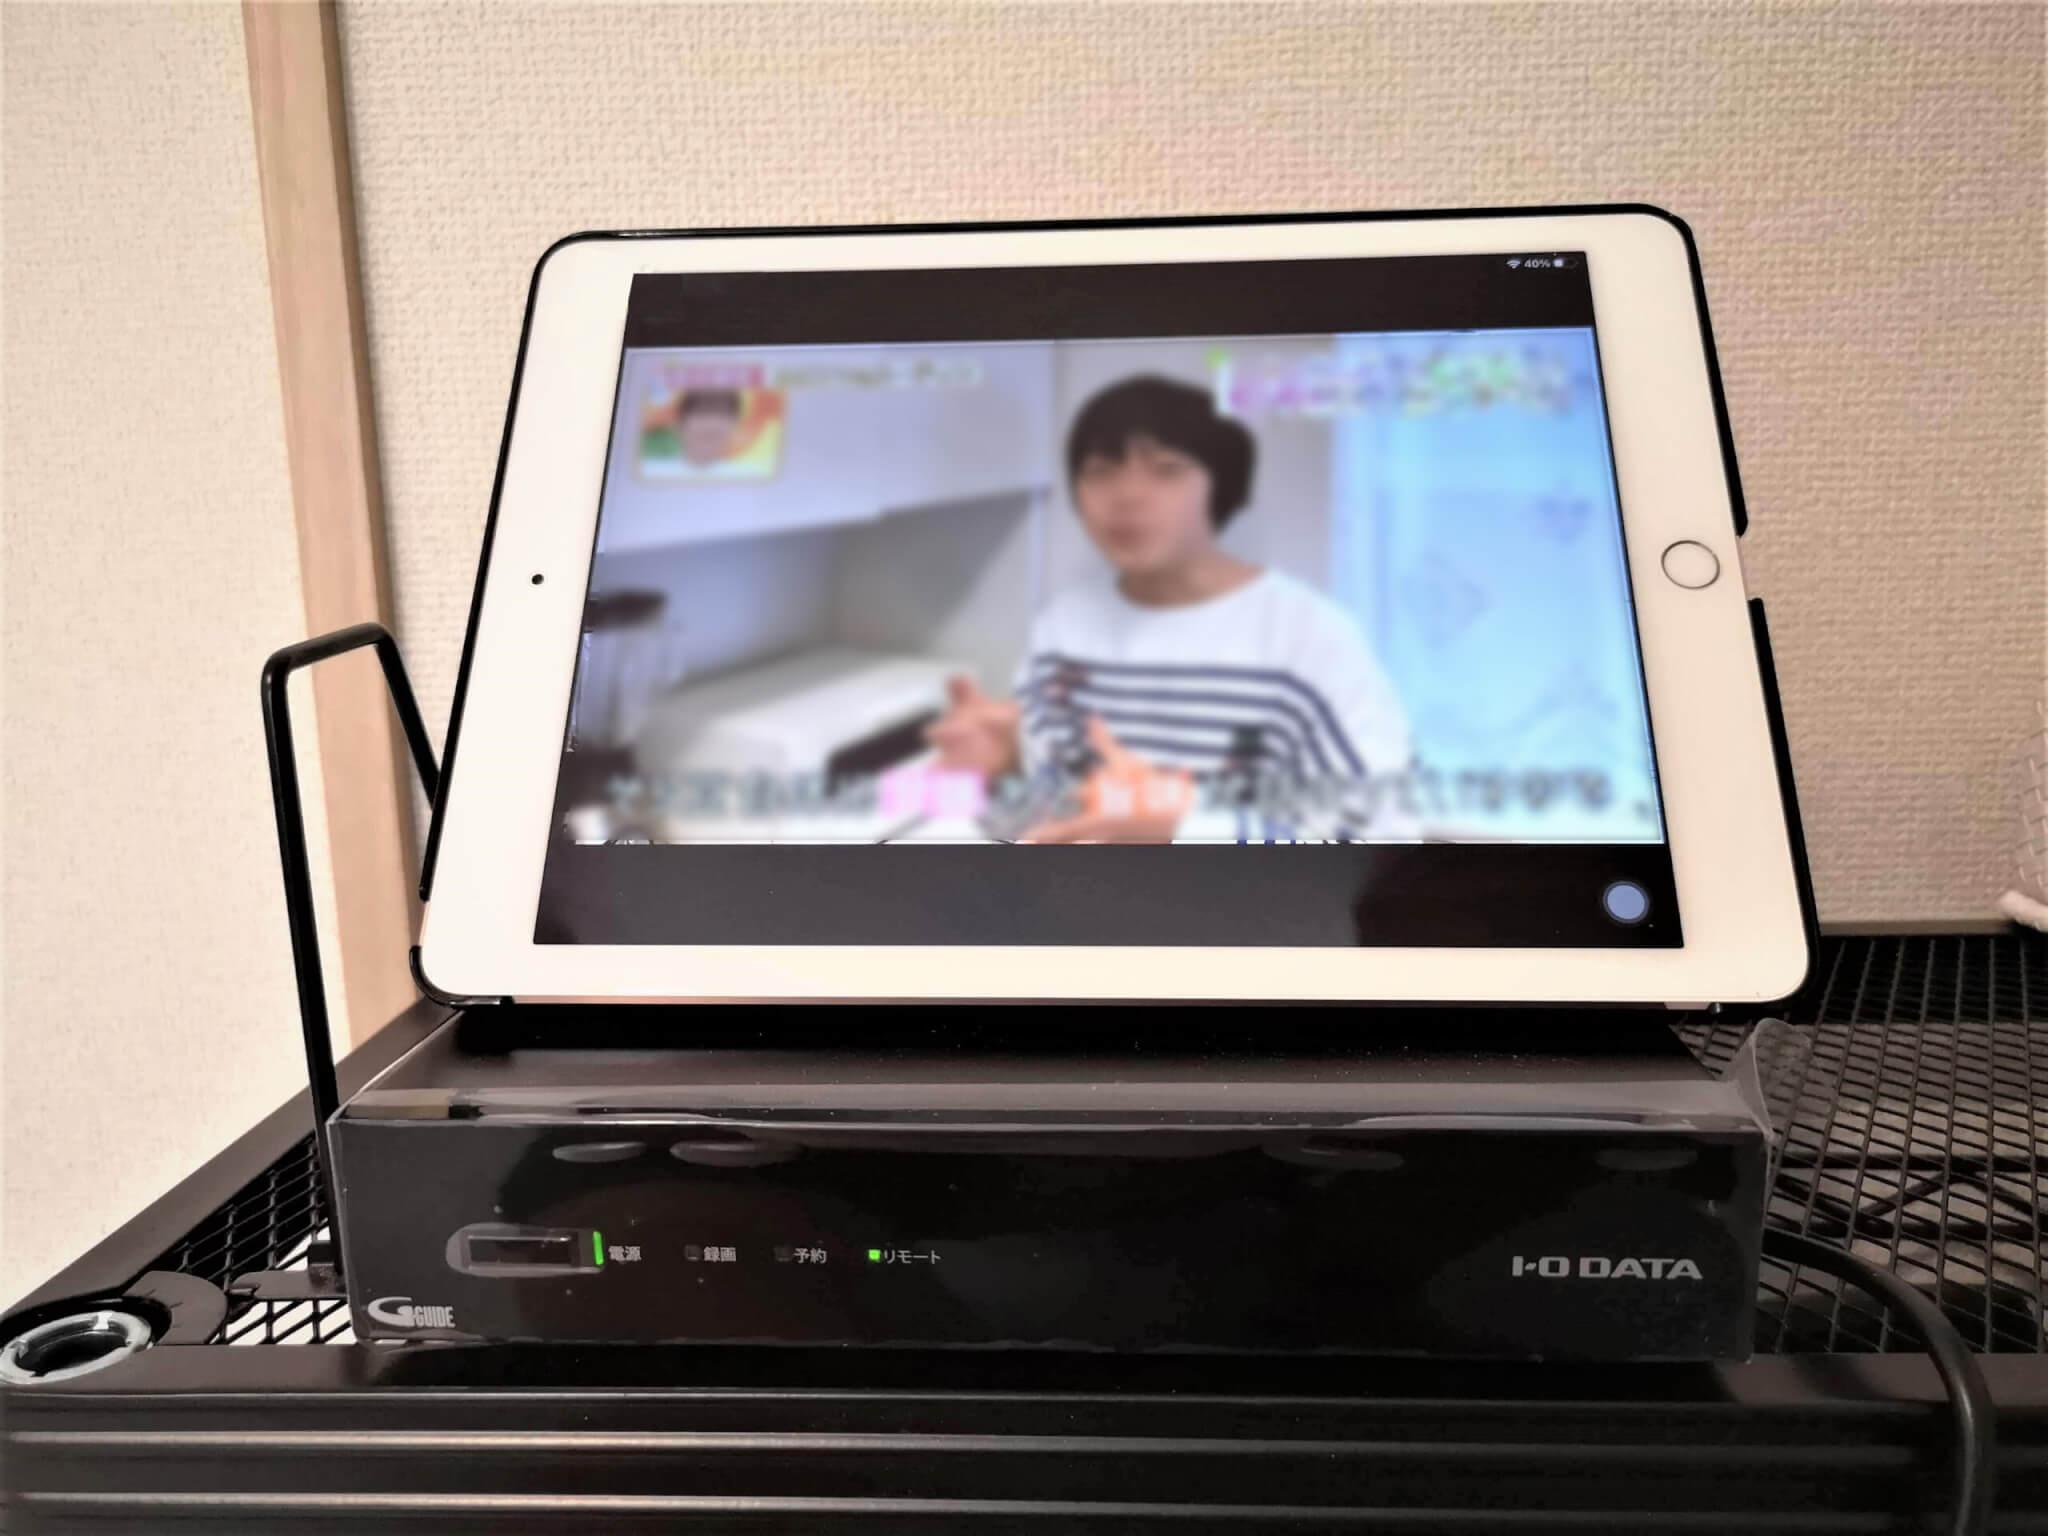 I-O DATA「GV-NTX1A テレビチューナー」使用レビュー!スマホやタブレットでテレビ視聴を試してみた